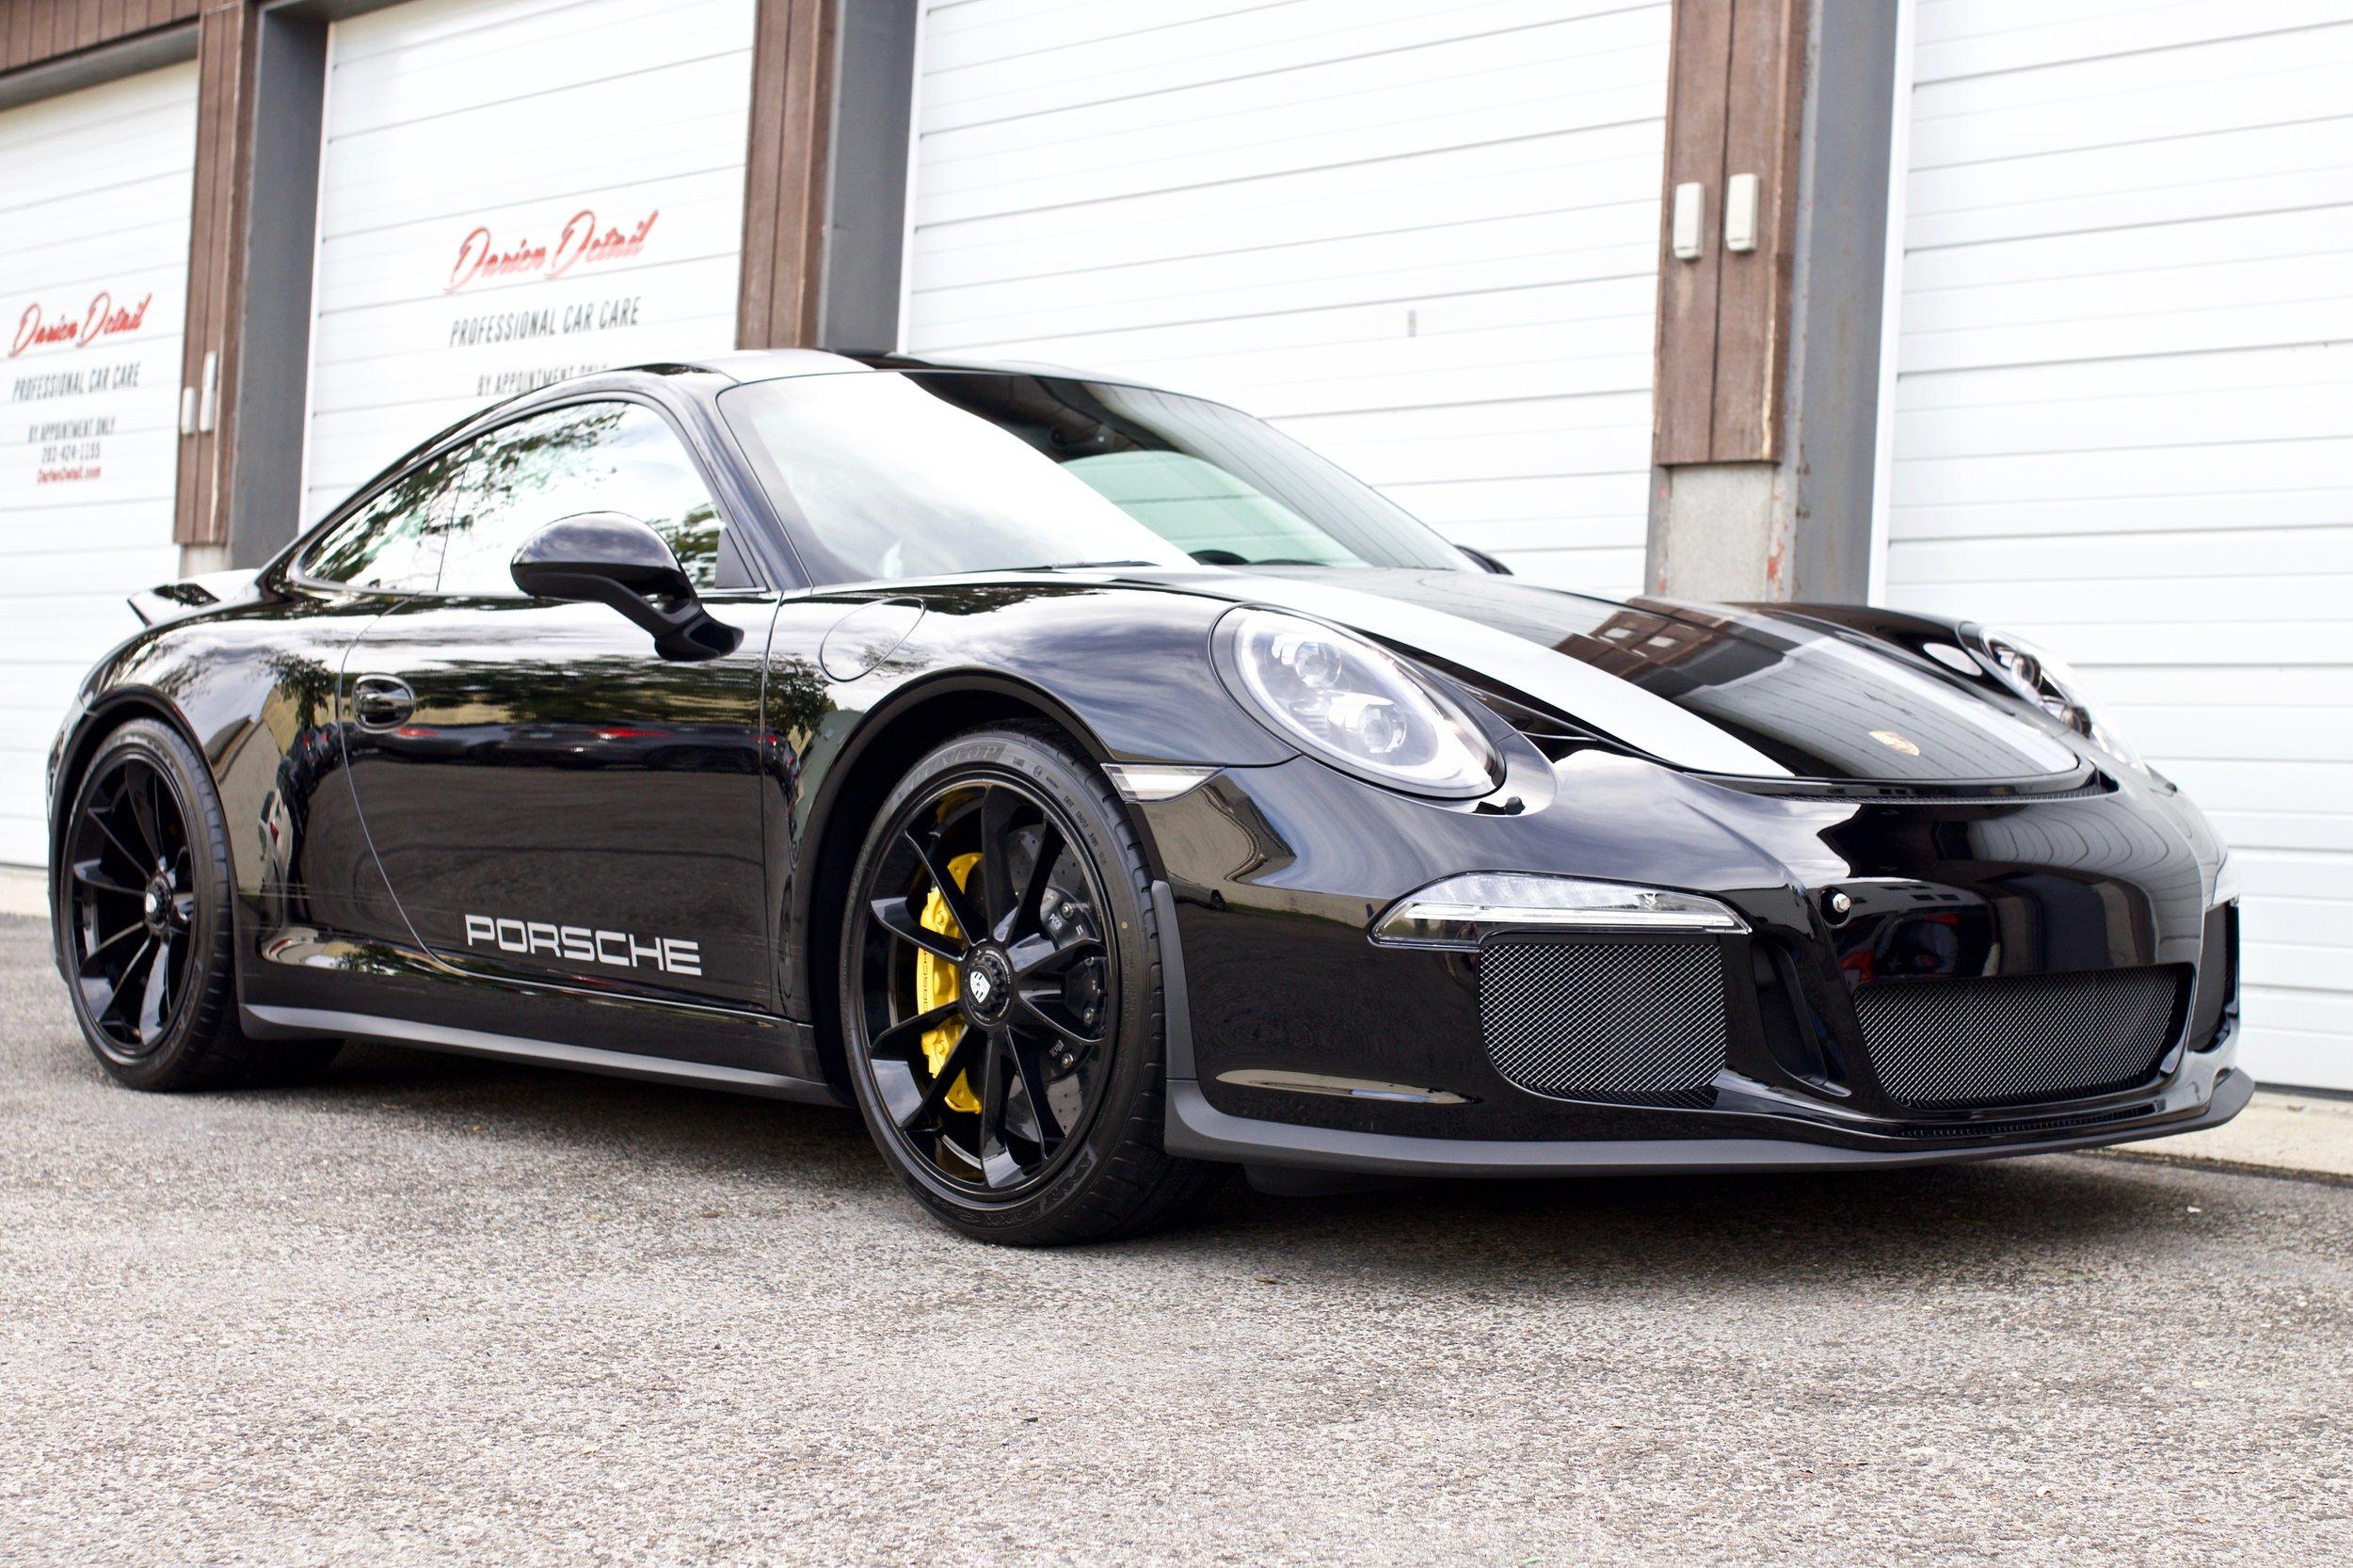 Black Porsche 911 R Full Body Wrap In Xpel Paint Protection Film Darien Detail